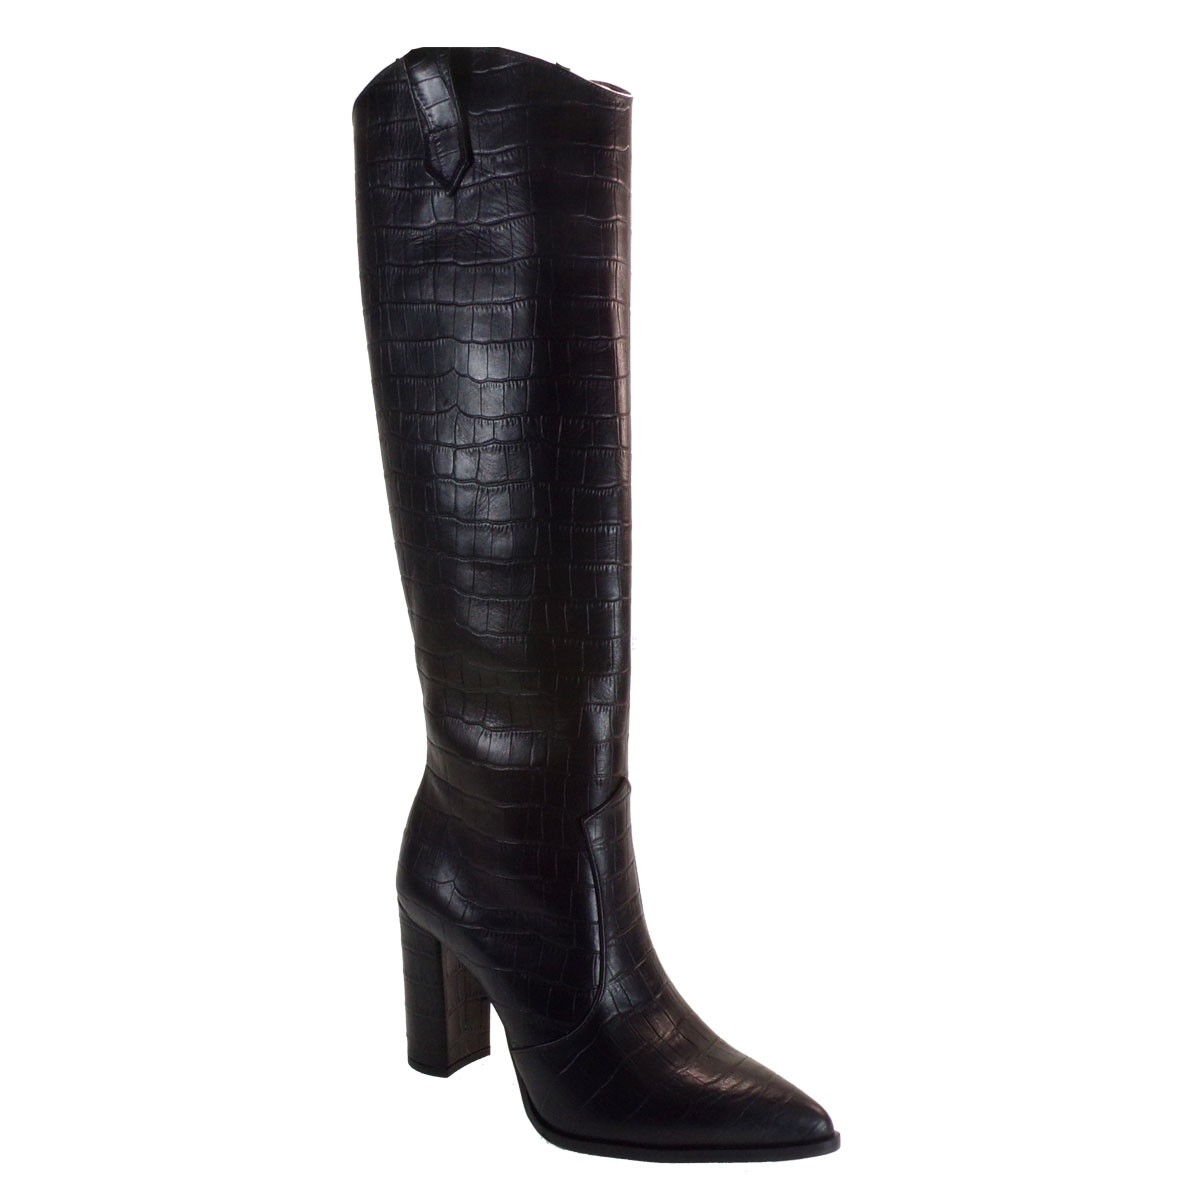 Fardoulis Shoes Γυναικεία Μπότα COW BOY 7128X Μαύρο Δέρμα KROKO